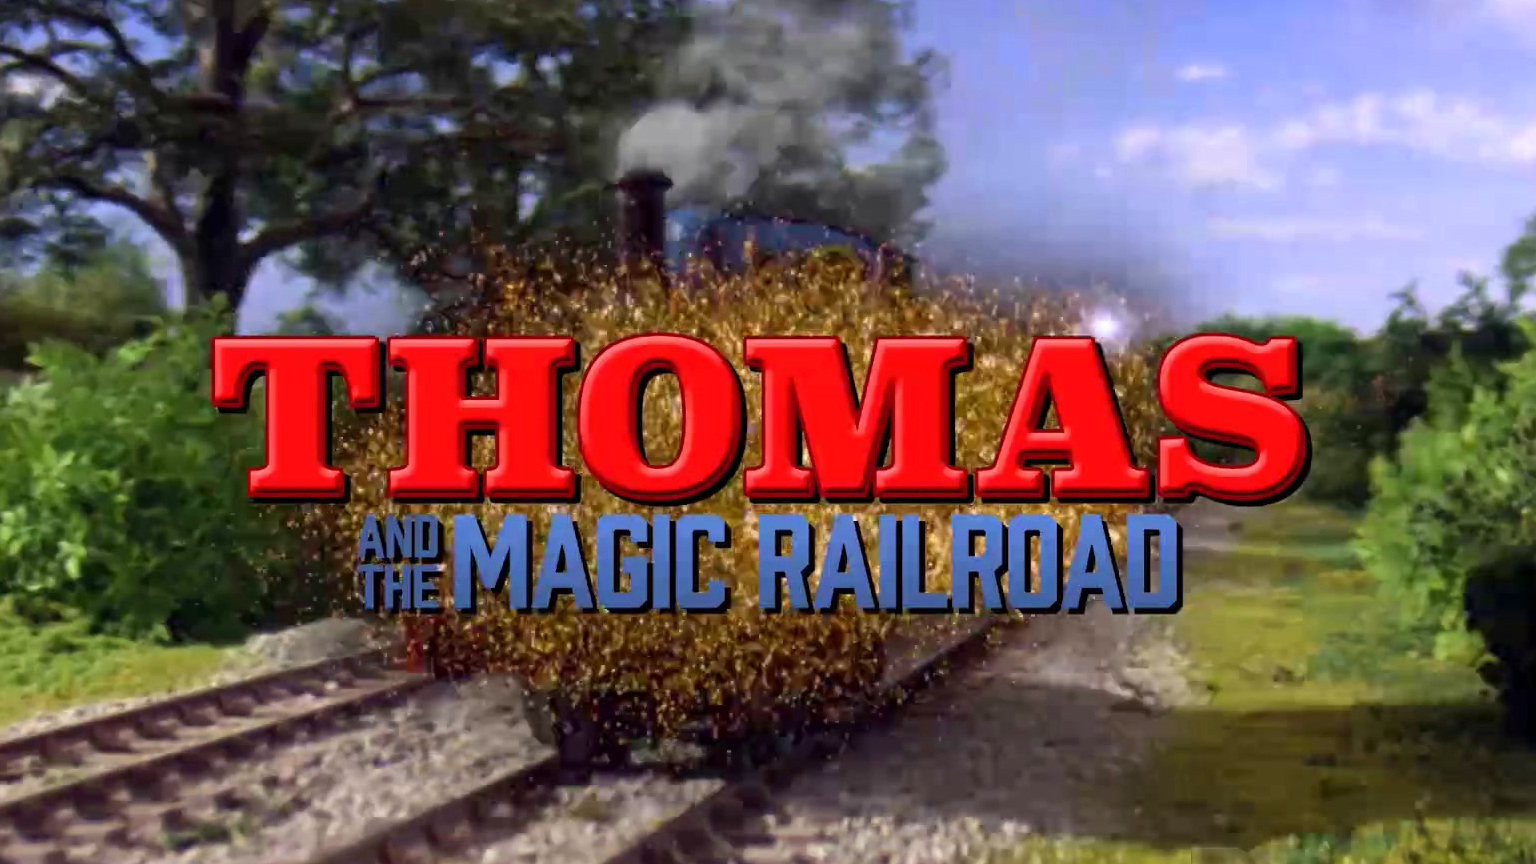 Thomas And The Magic Railroad (20th Anniversary Fathom Events Trailer)